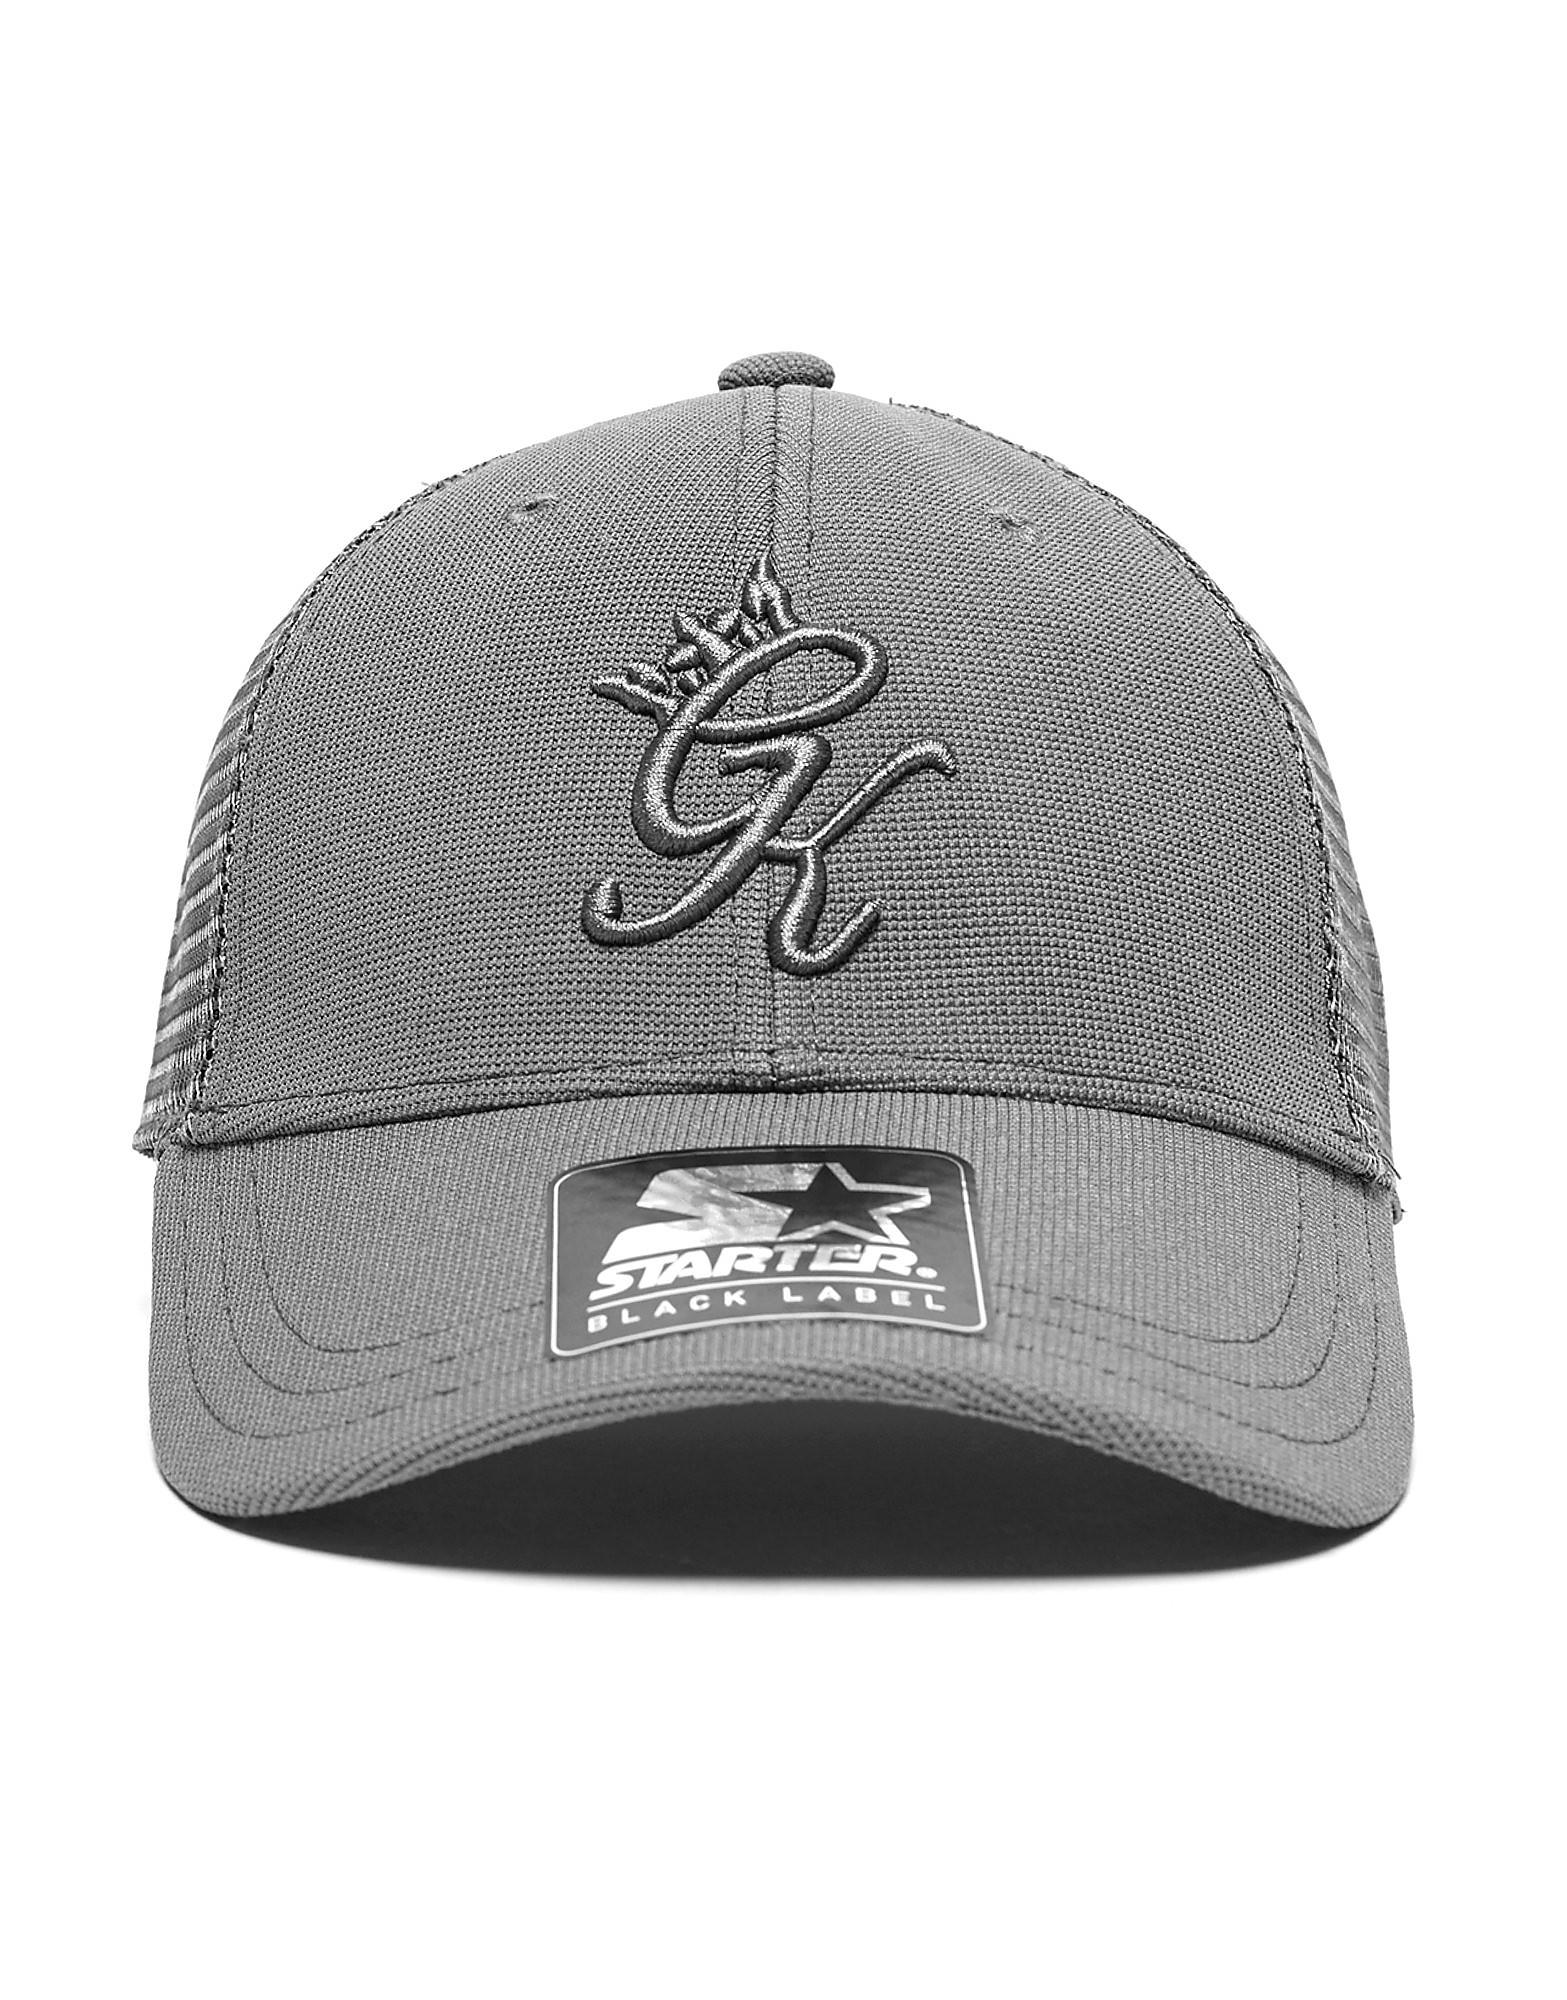 Gym King Trucker Cap